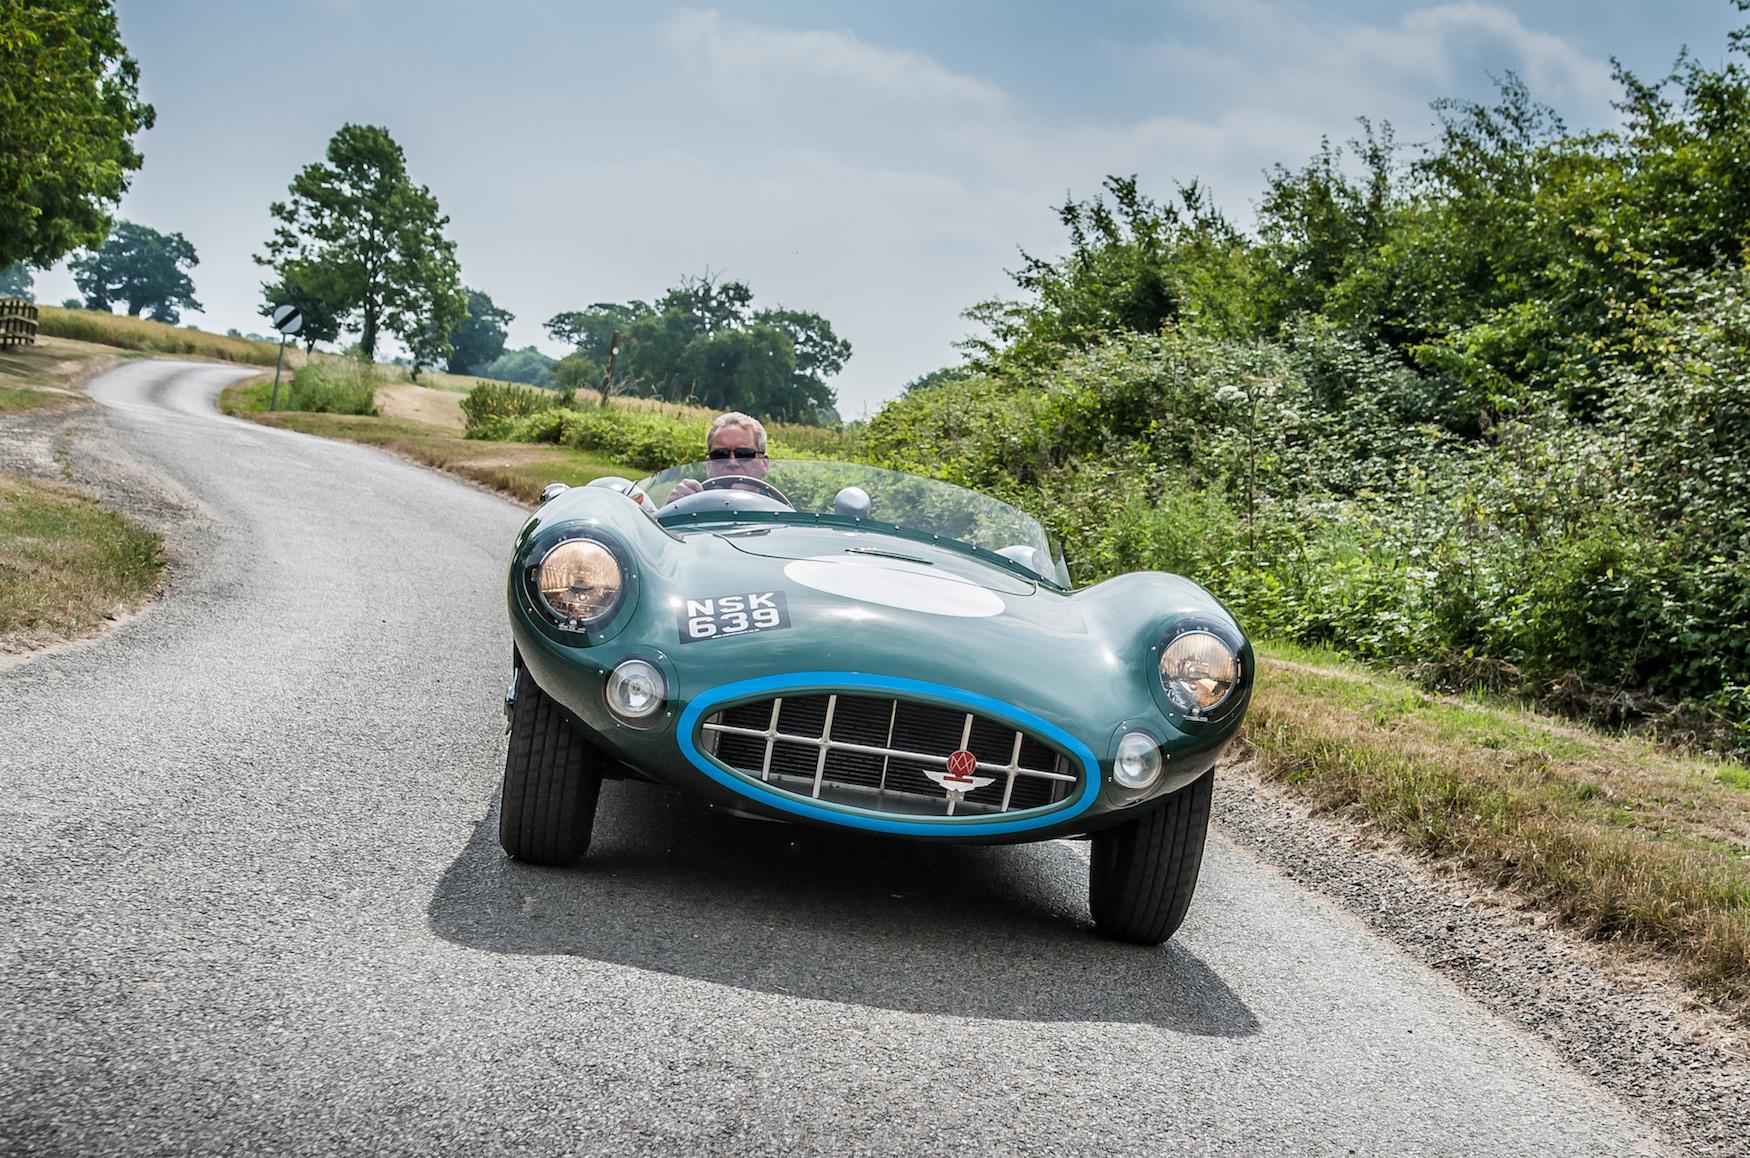 ASM R1 on road Aston Martin DBR1 replica